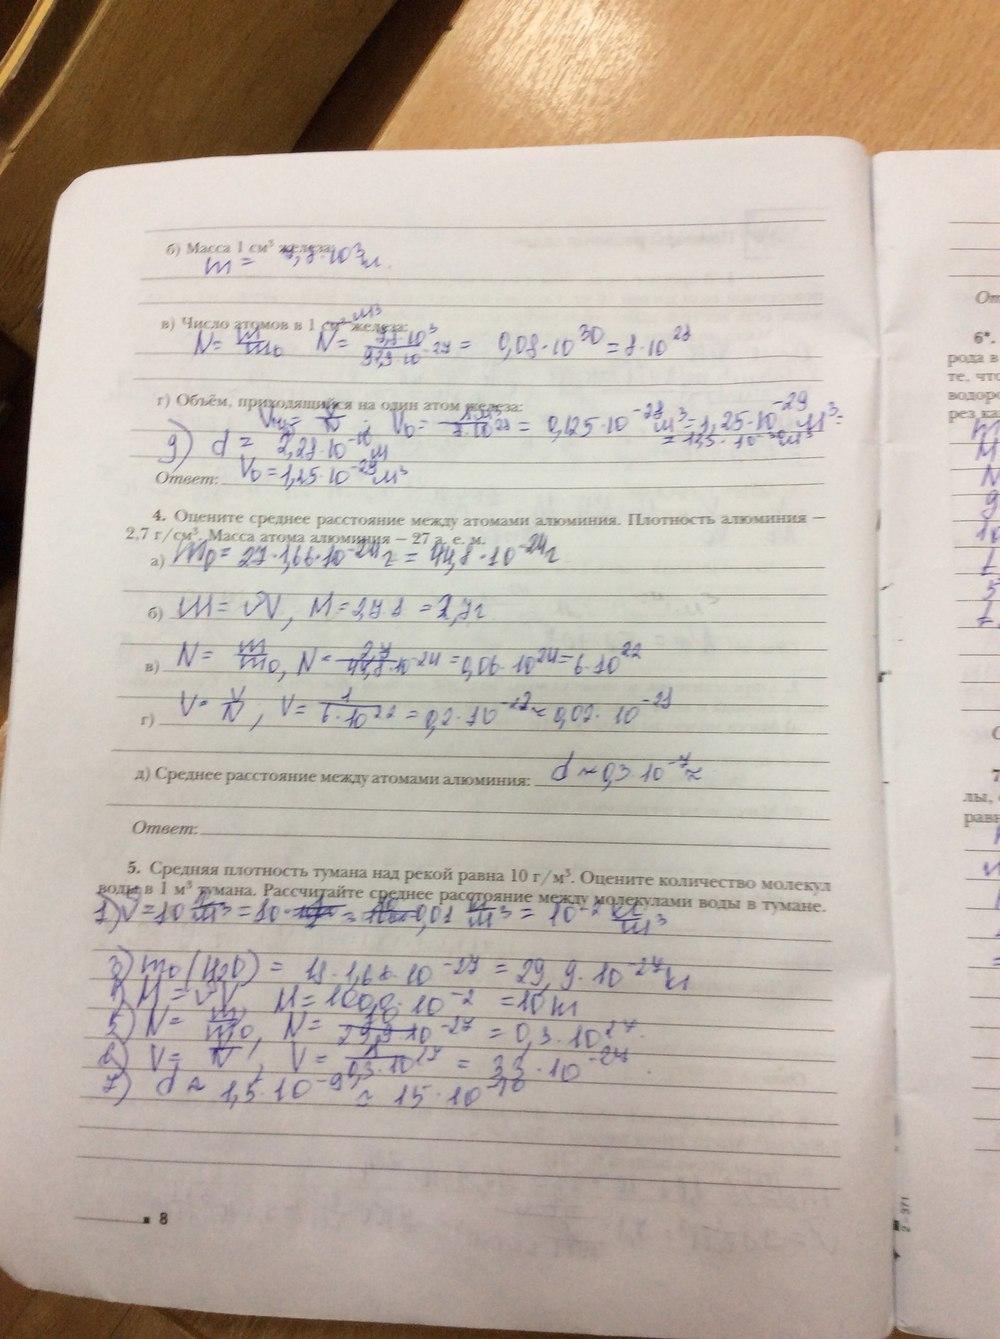 Гдз по физике перышкин погожев 8 класс